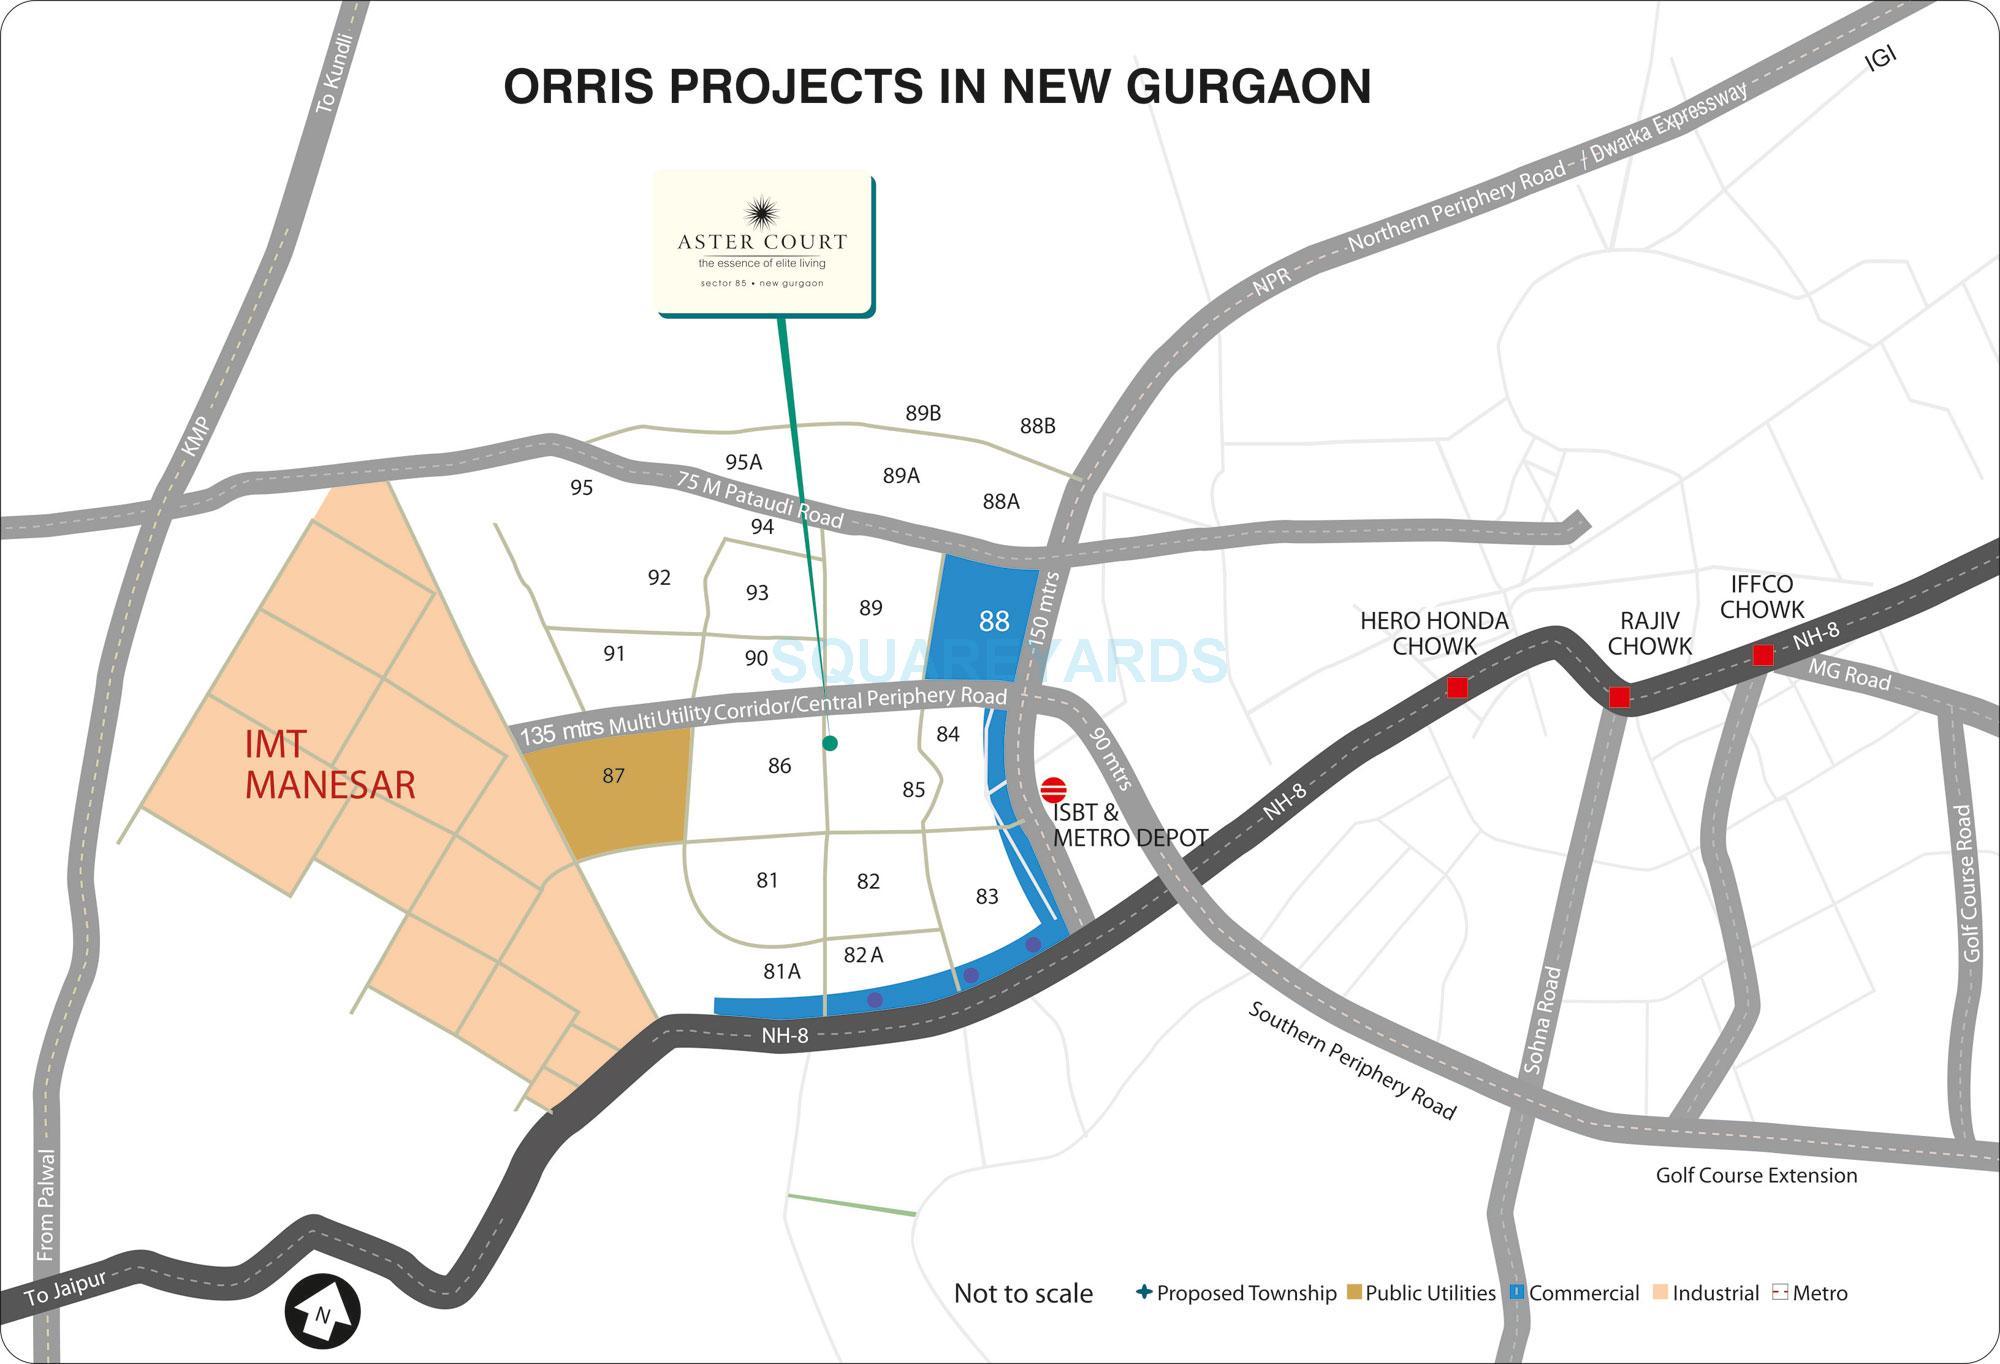 orris aster court location image1